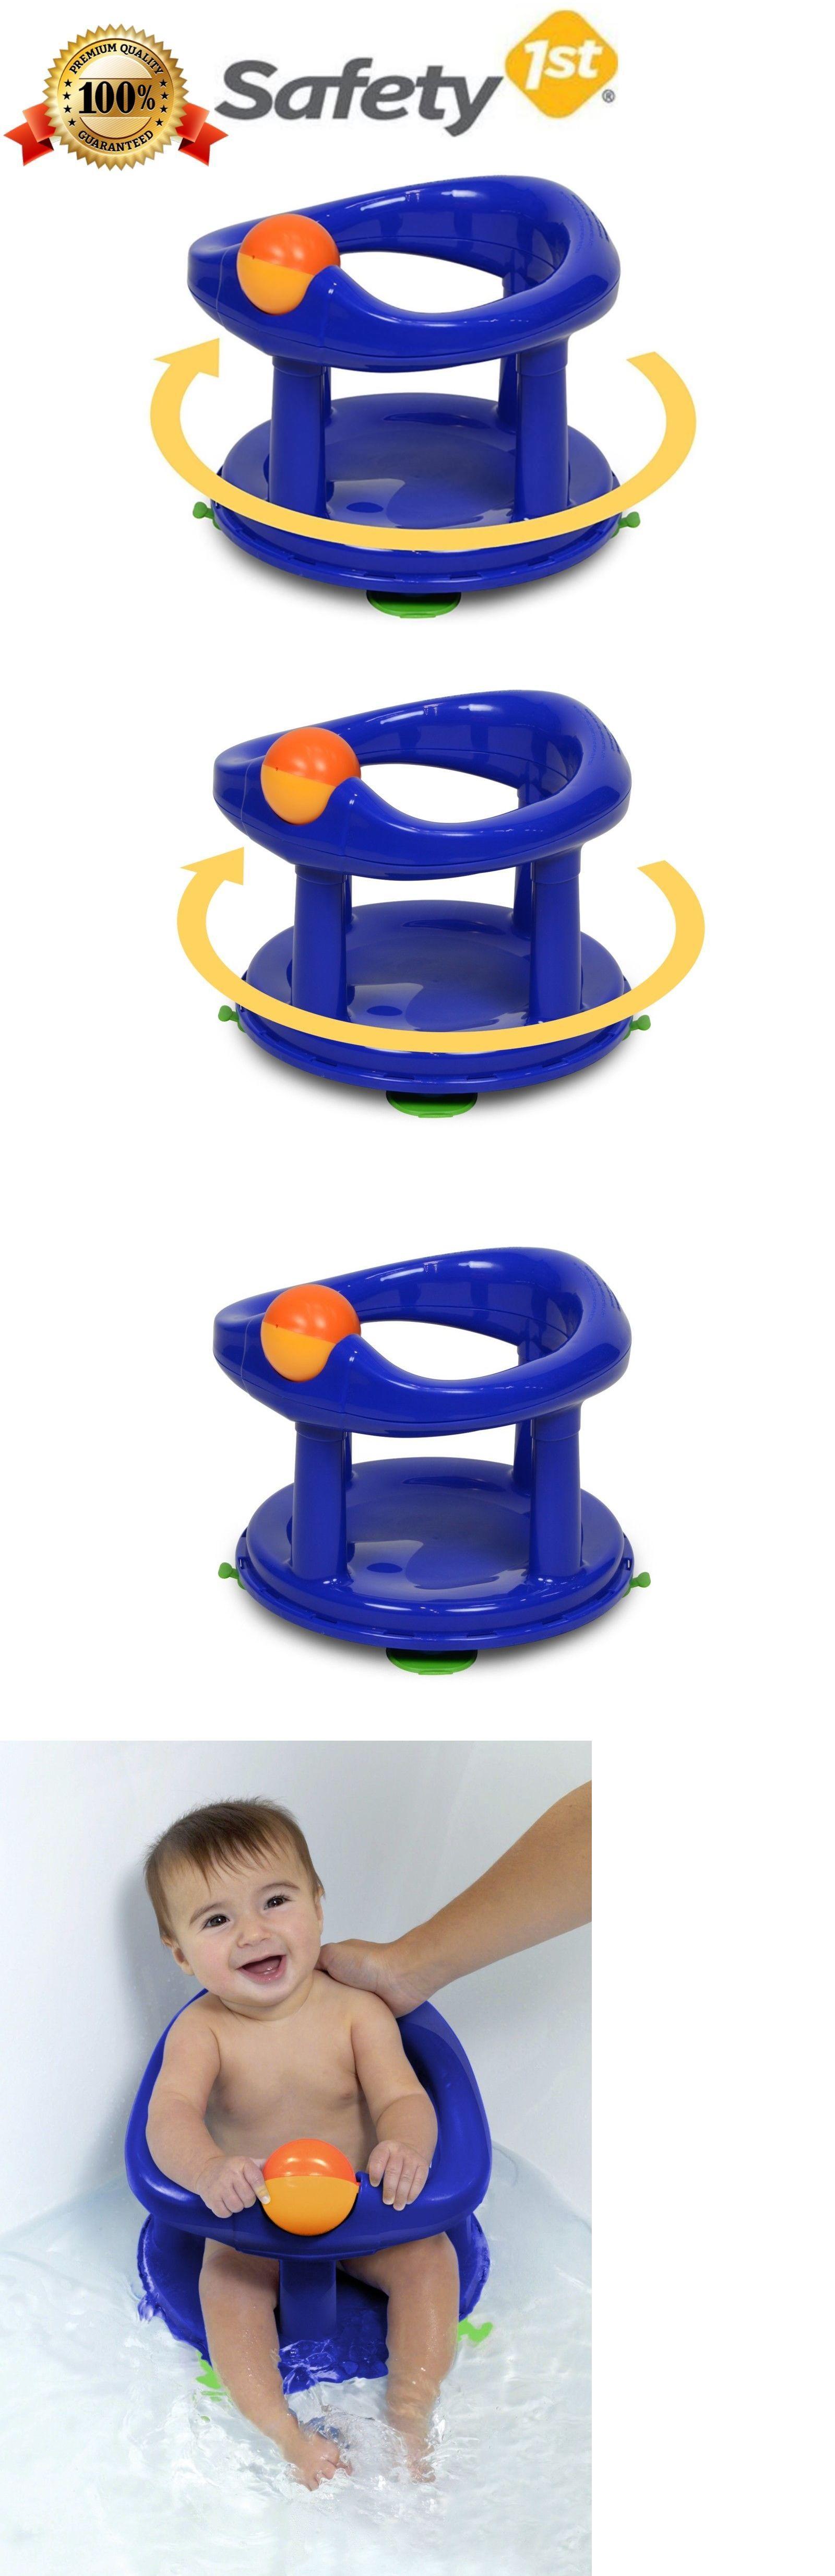 Bath Tub Seats and Rings 162024: Safety First Swivel Baby Bath Tub ...